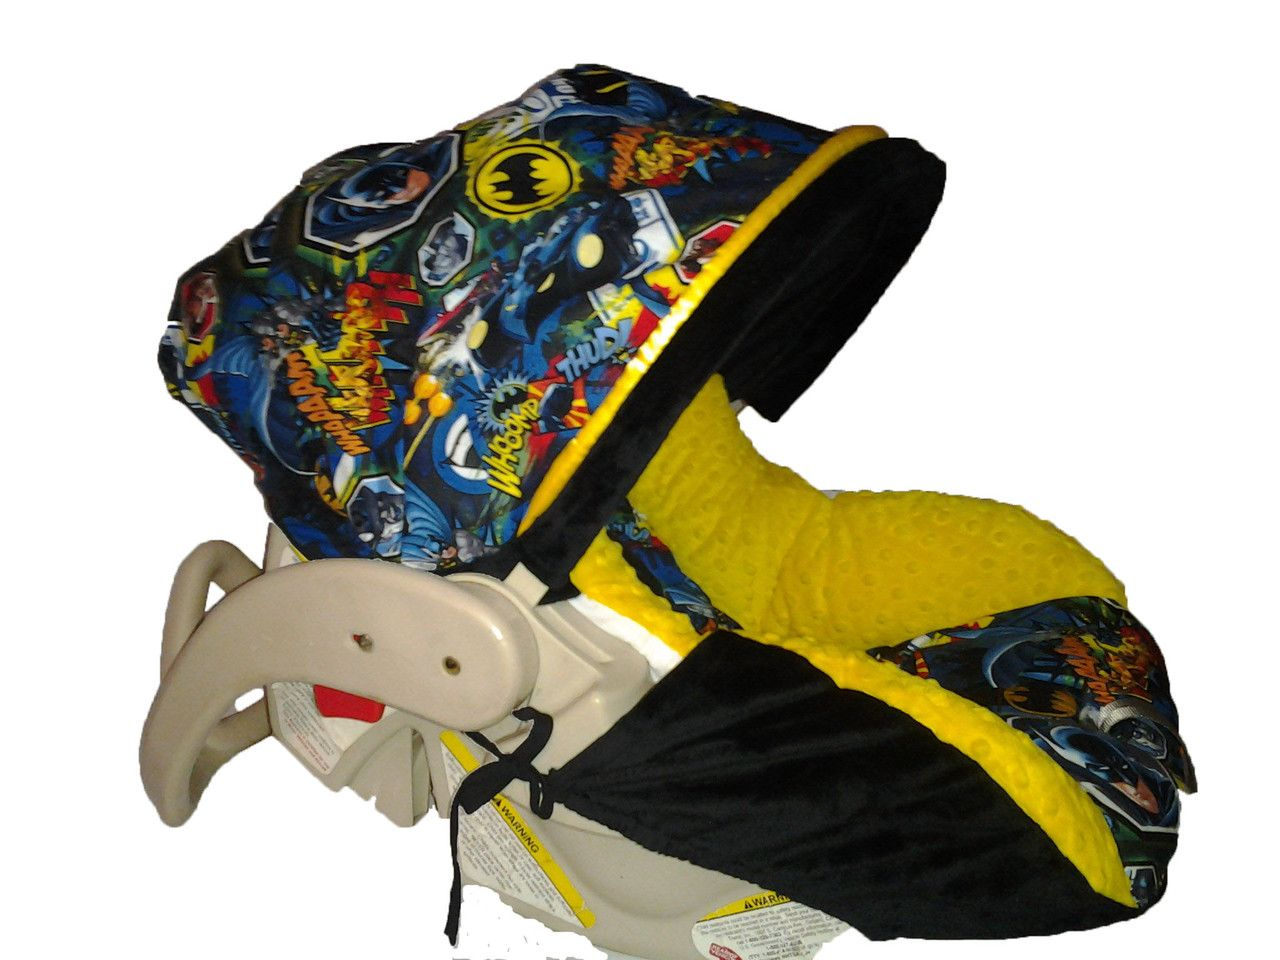 How To Make Batman Car Seat Covers